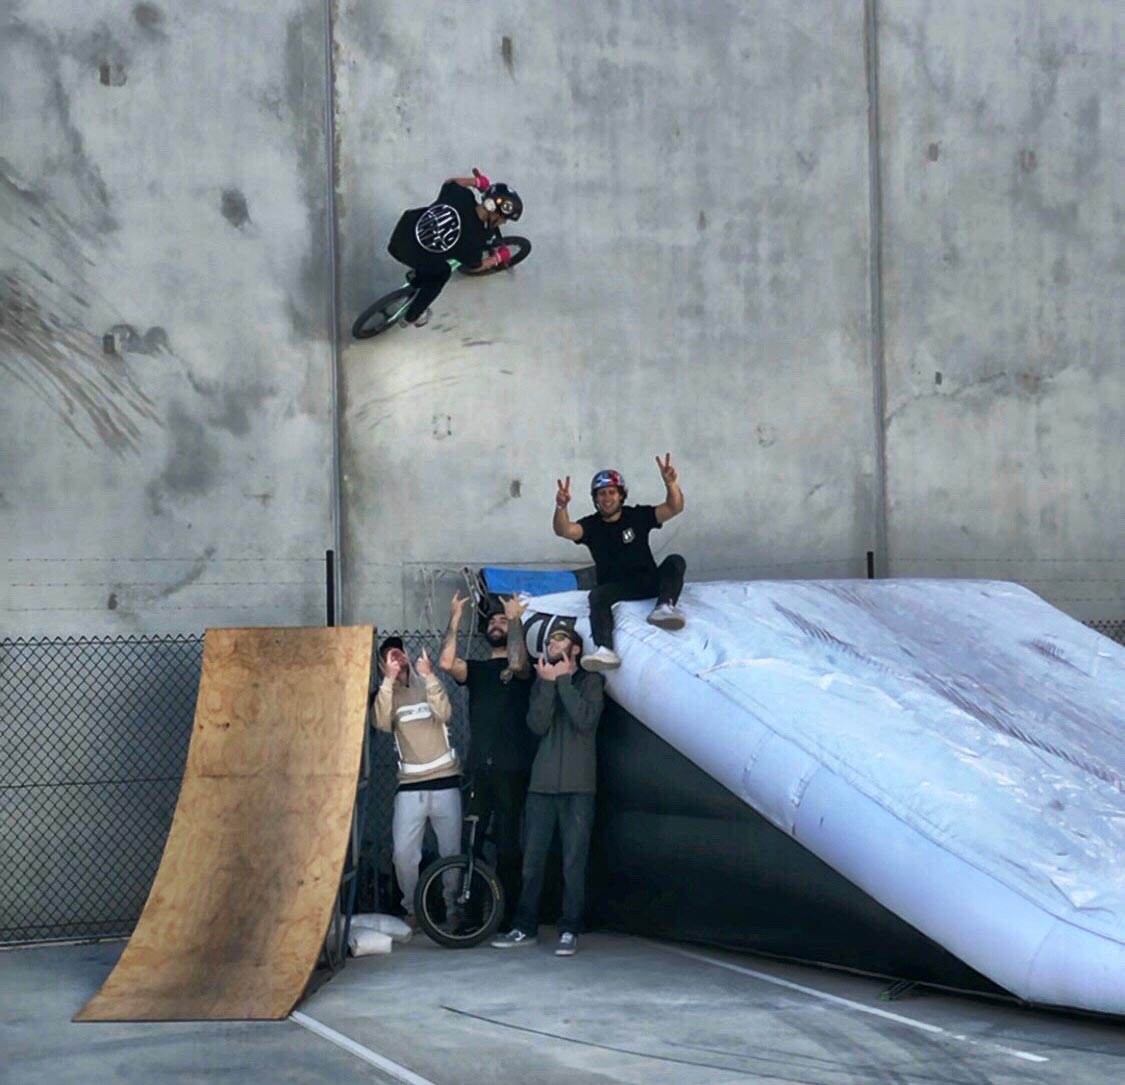 bmx-lander-ramp-wall-ride-01.jpg